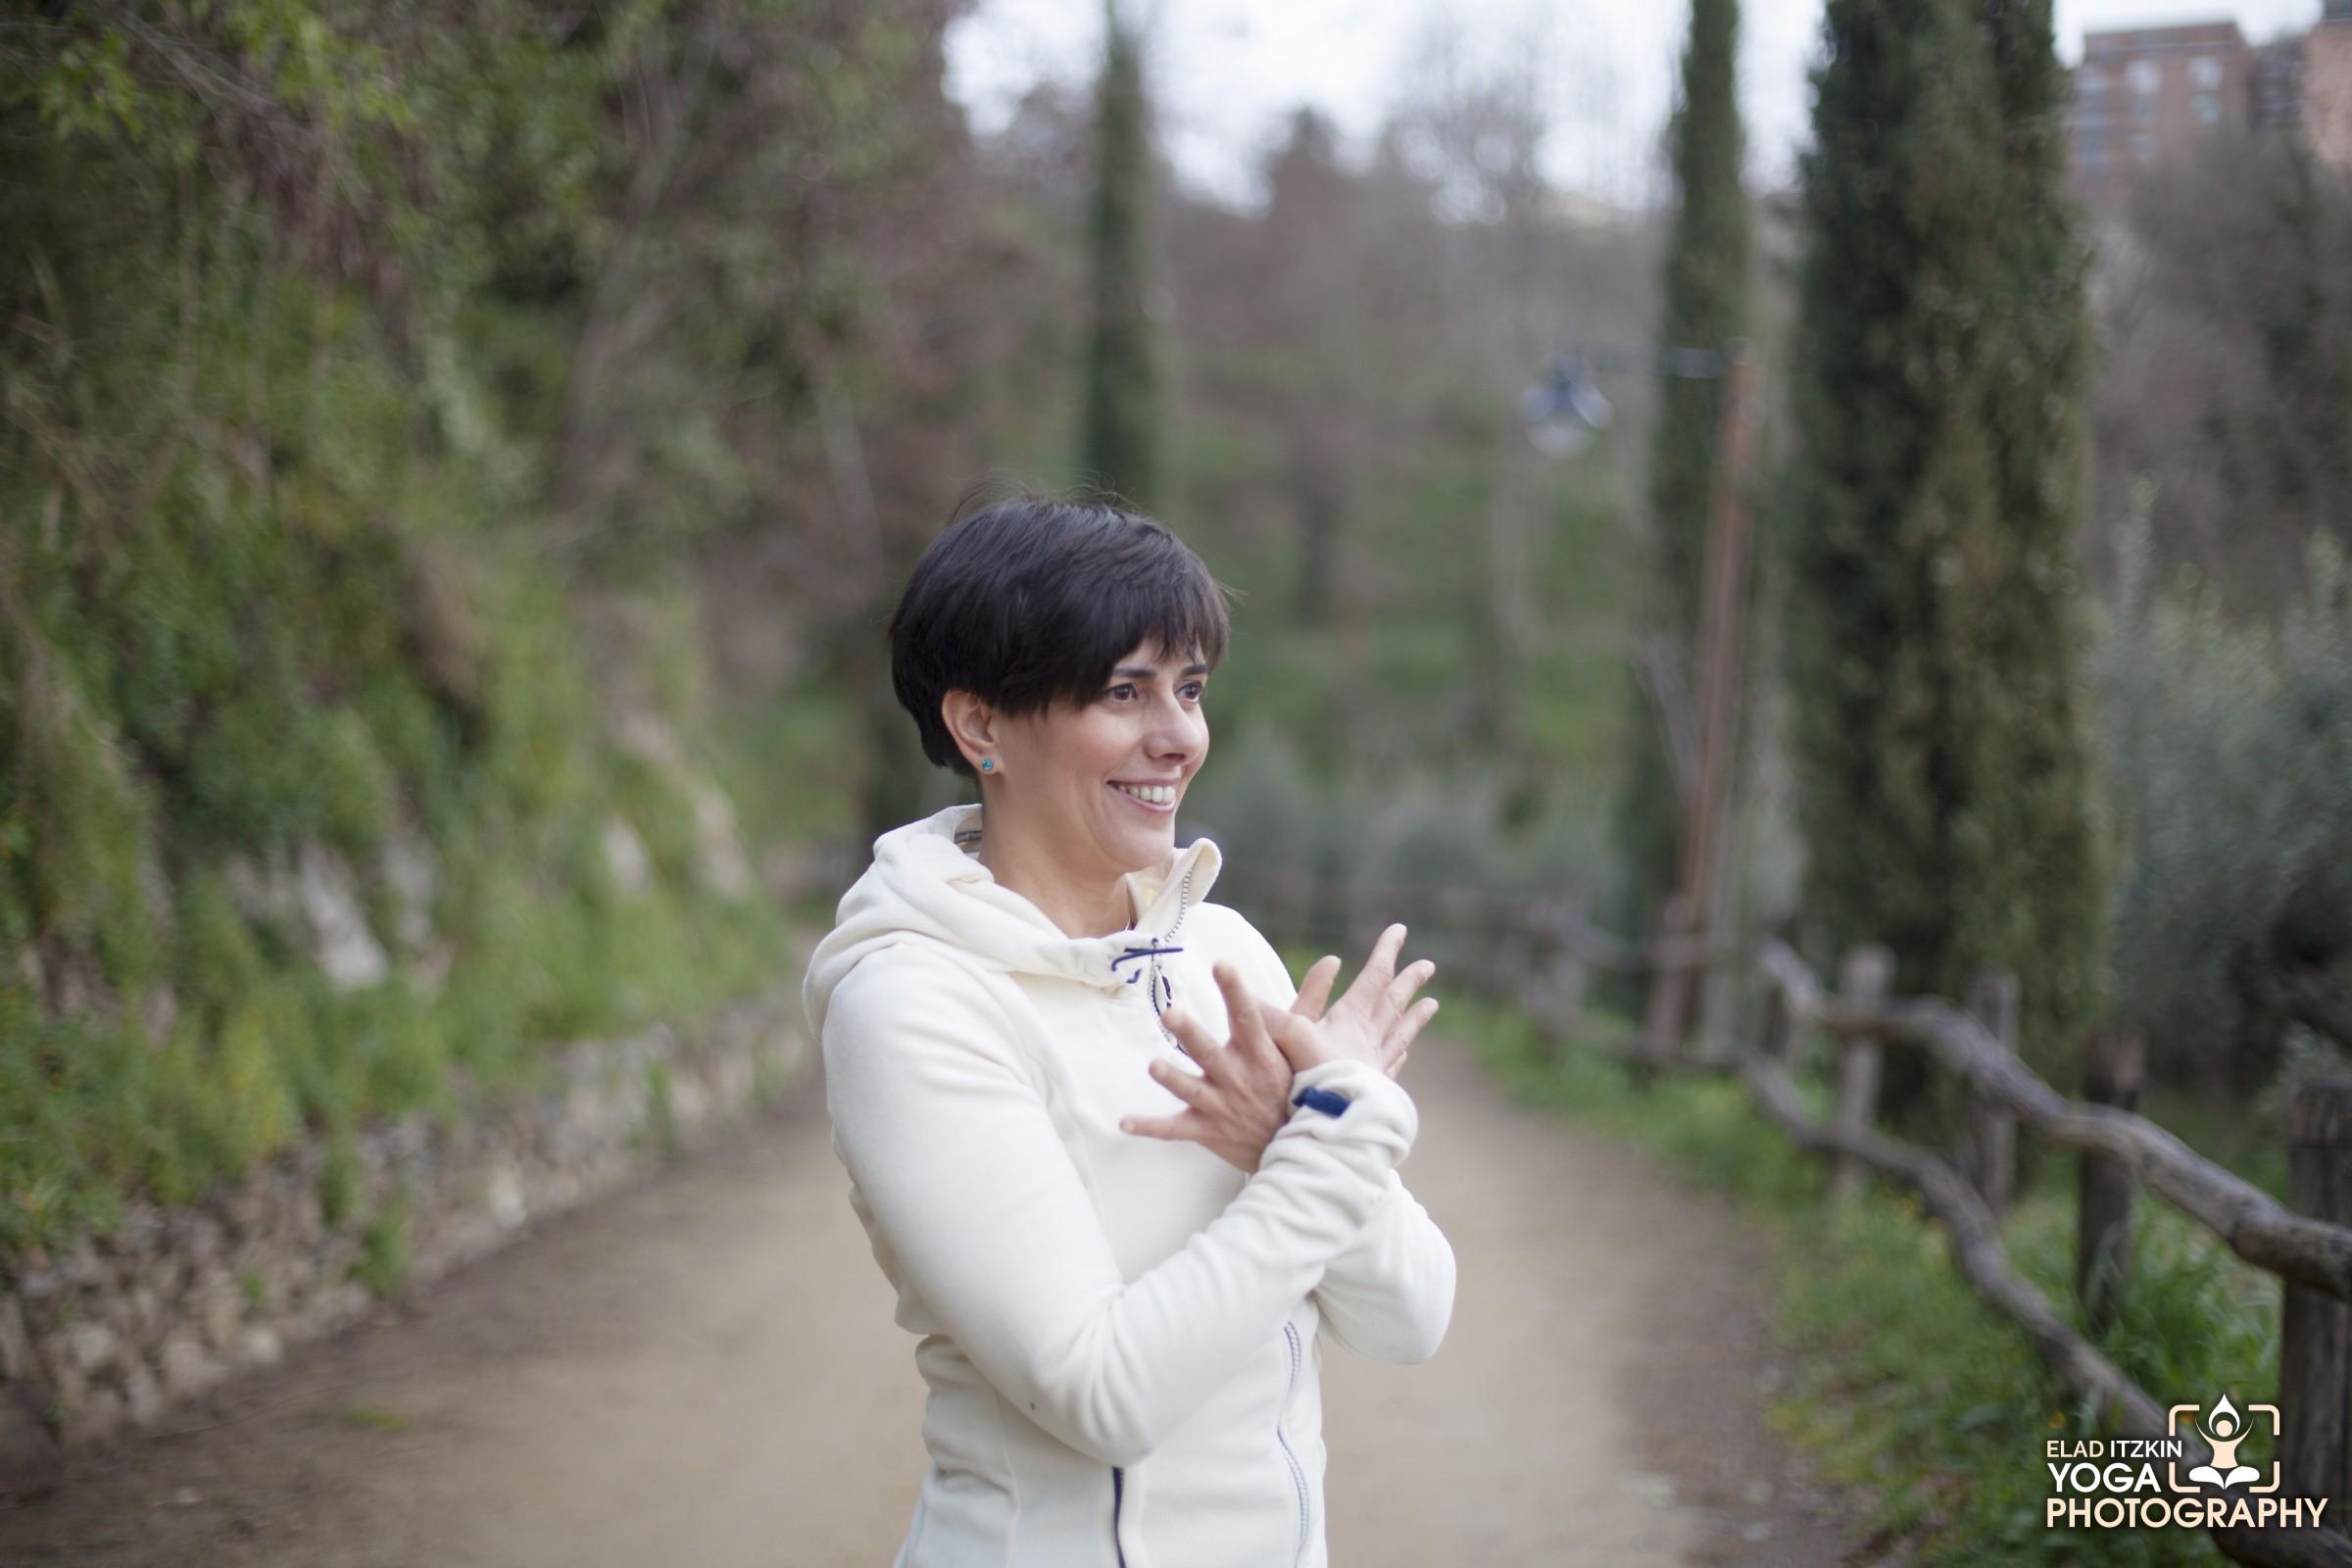 Rosalba Maida Yoga Interview, Catanzaro, Calabria, Italy, Yoga Photo, Elad Itzkin Yoga Photography